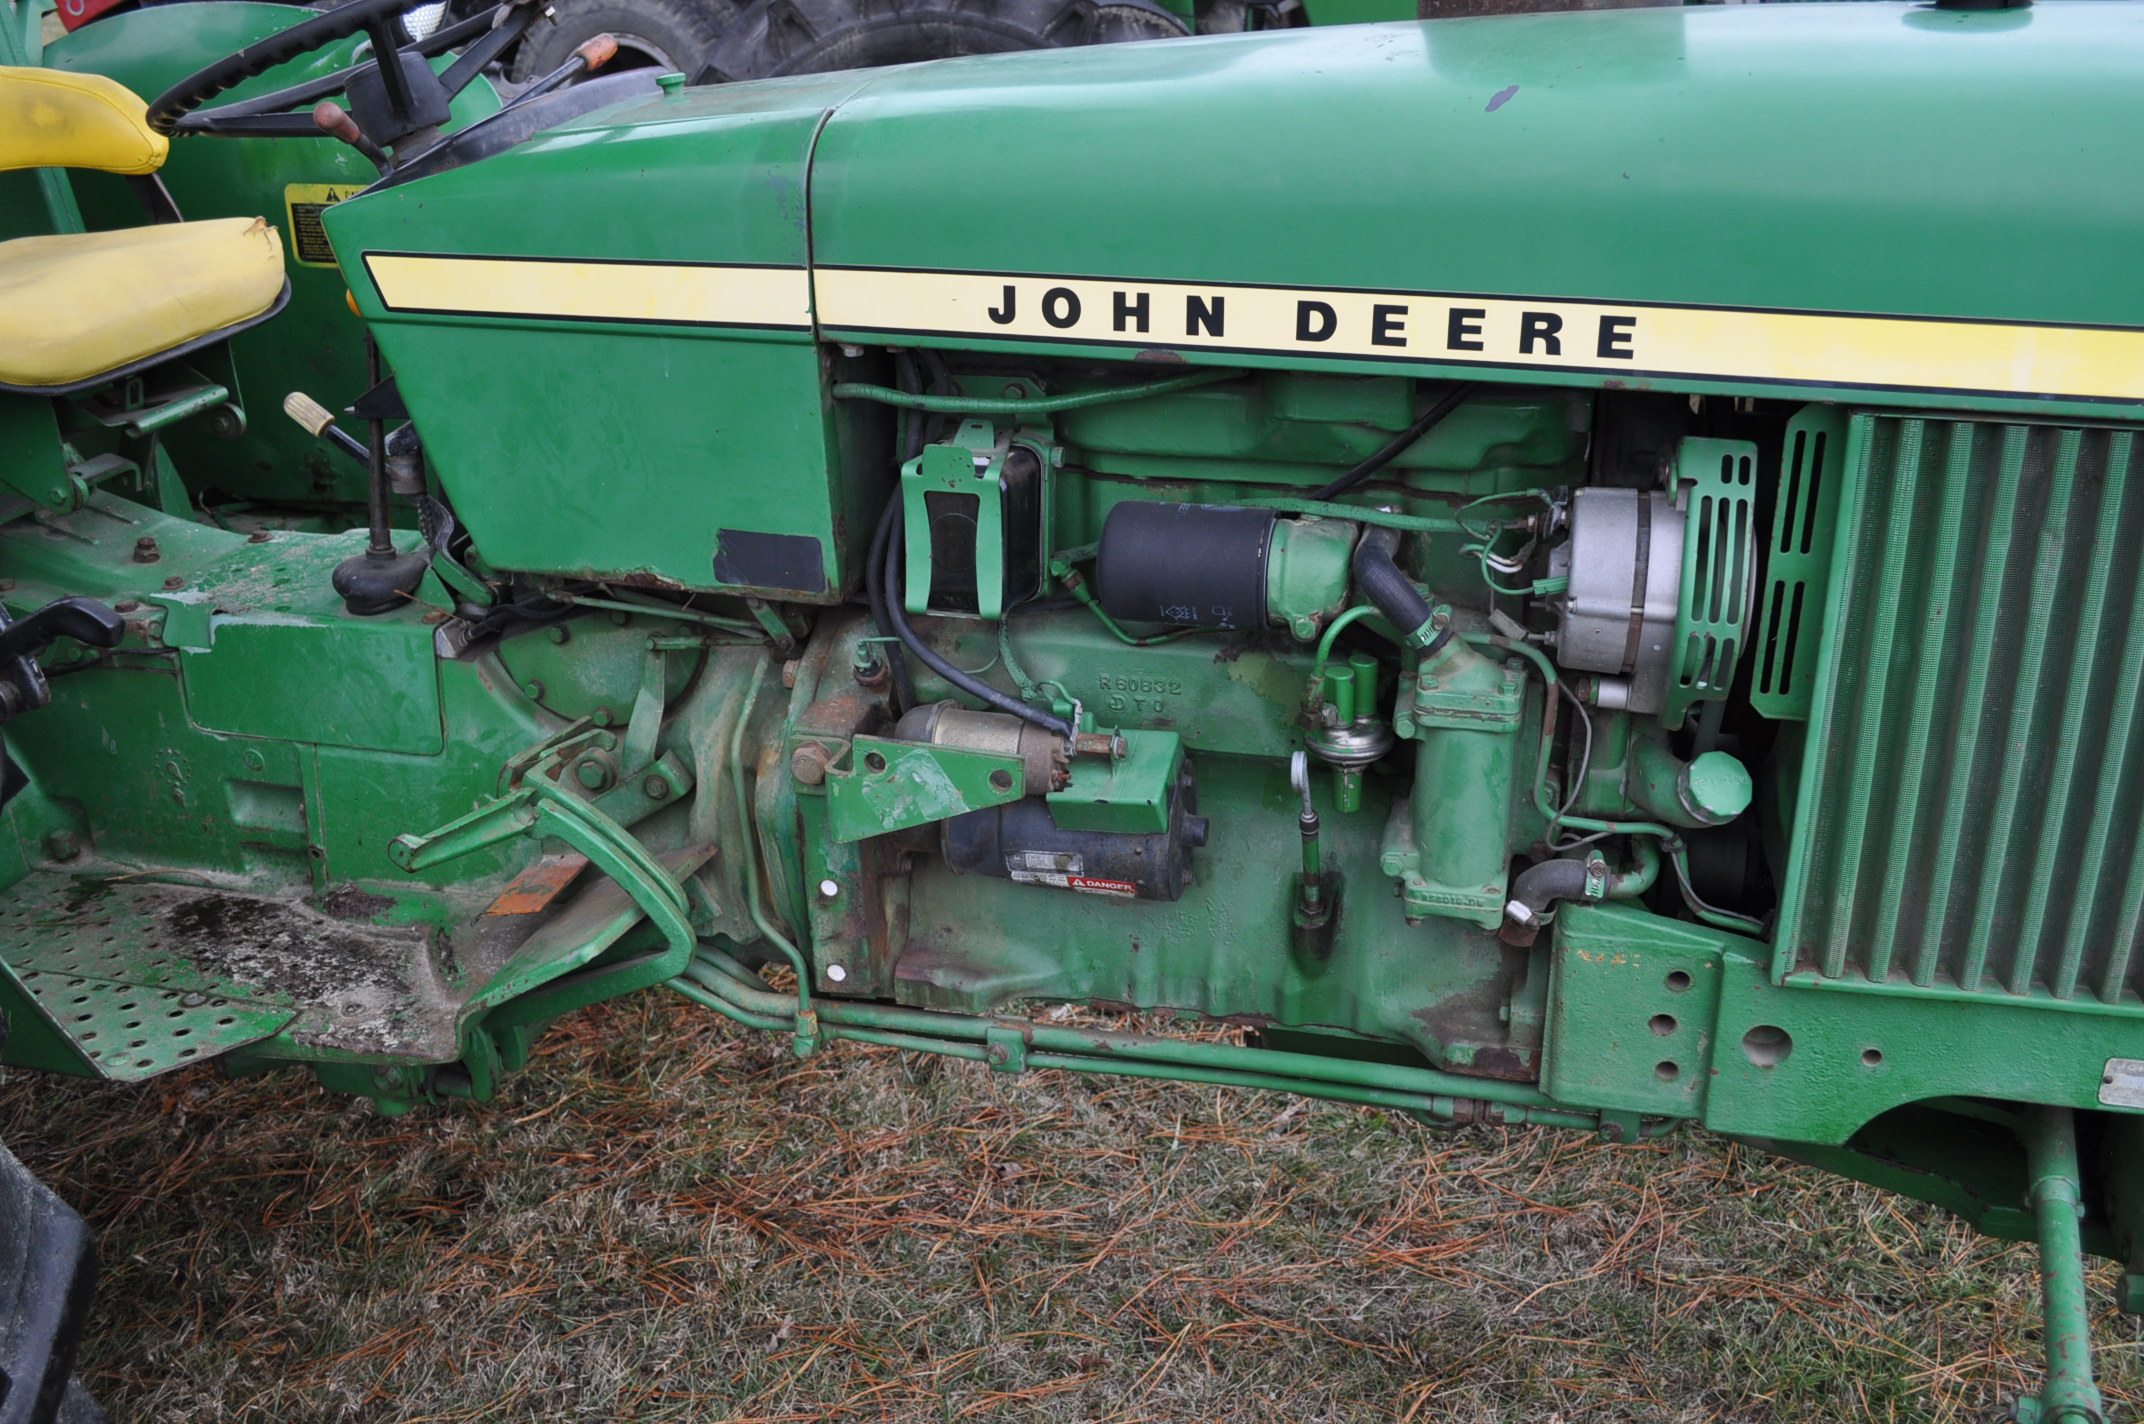 John Deere 2630 tractor, diesel, 16.9-28 rear, 9.5-15 front, 1 hyd remote, 540 pto, 3 pt, 4260 - Image 10 of 18